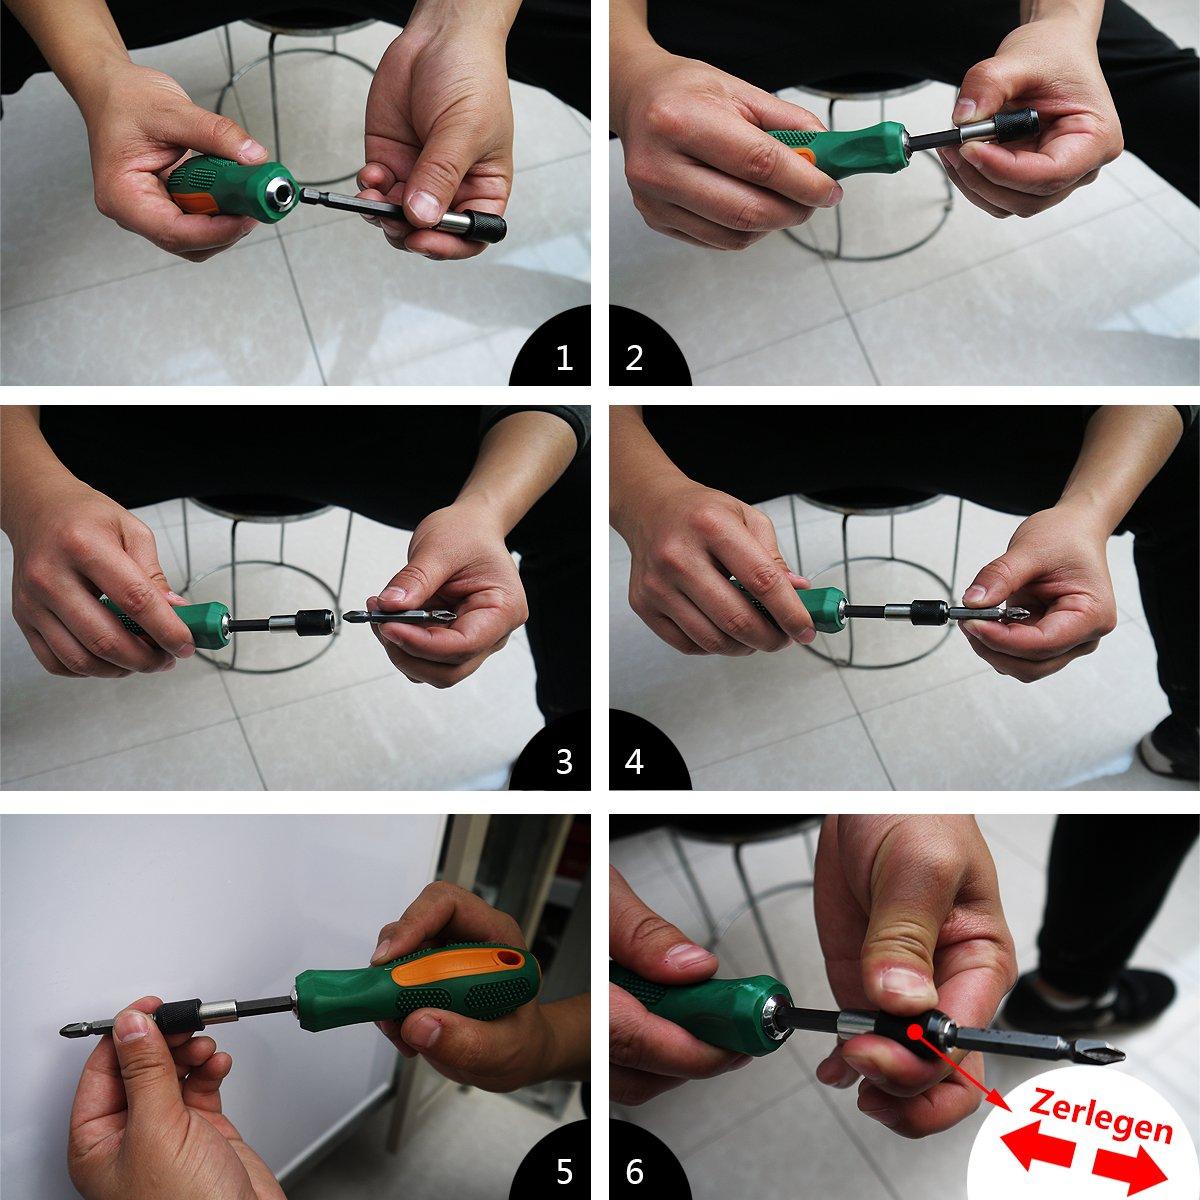 tefeler 3tlg Cambio Rápido Bit Plana 1/4 hexagonal magnética Bit Plana + alargador flexible 200 mm Destornillador Bit + 10pcs puntas para taladro